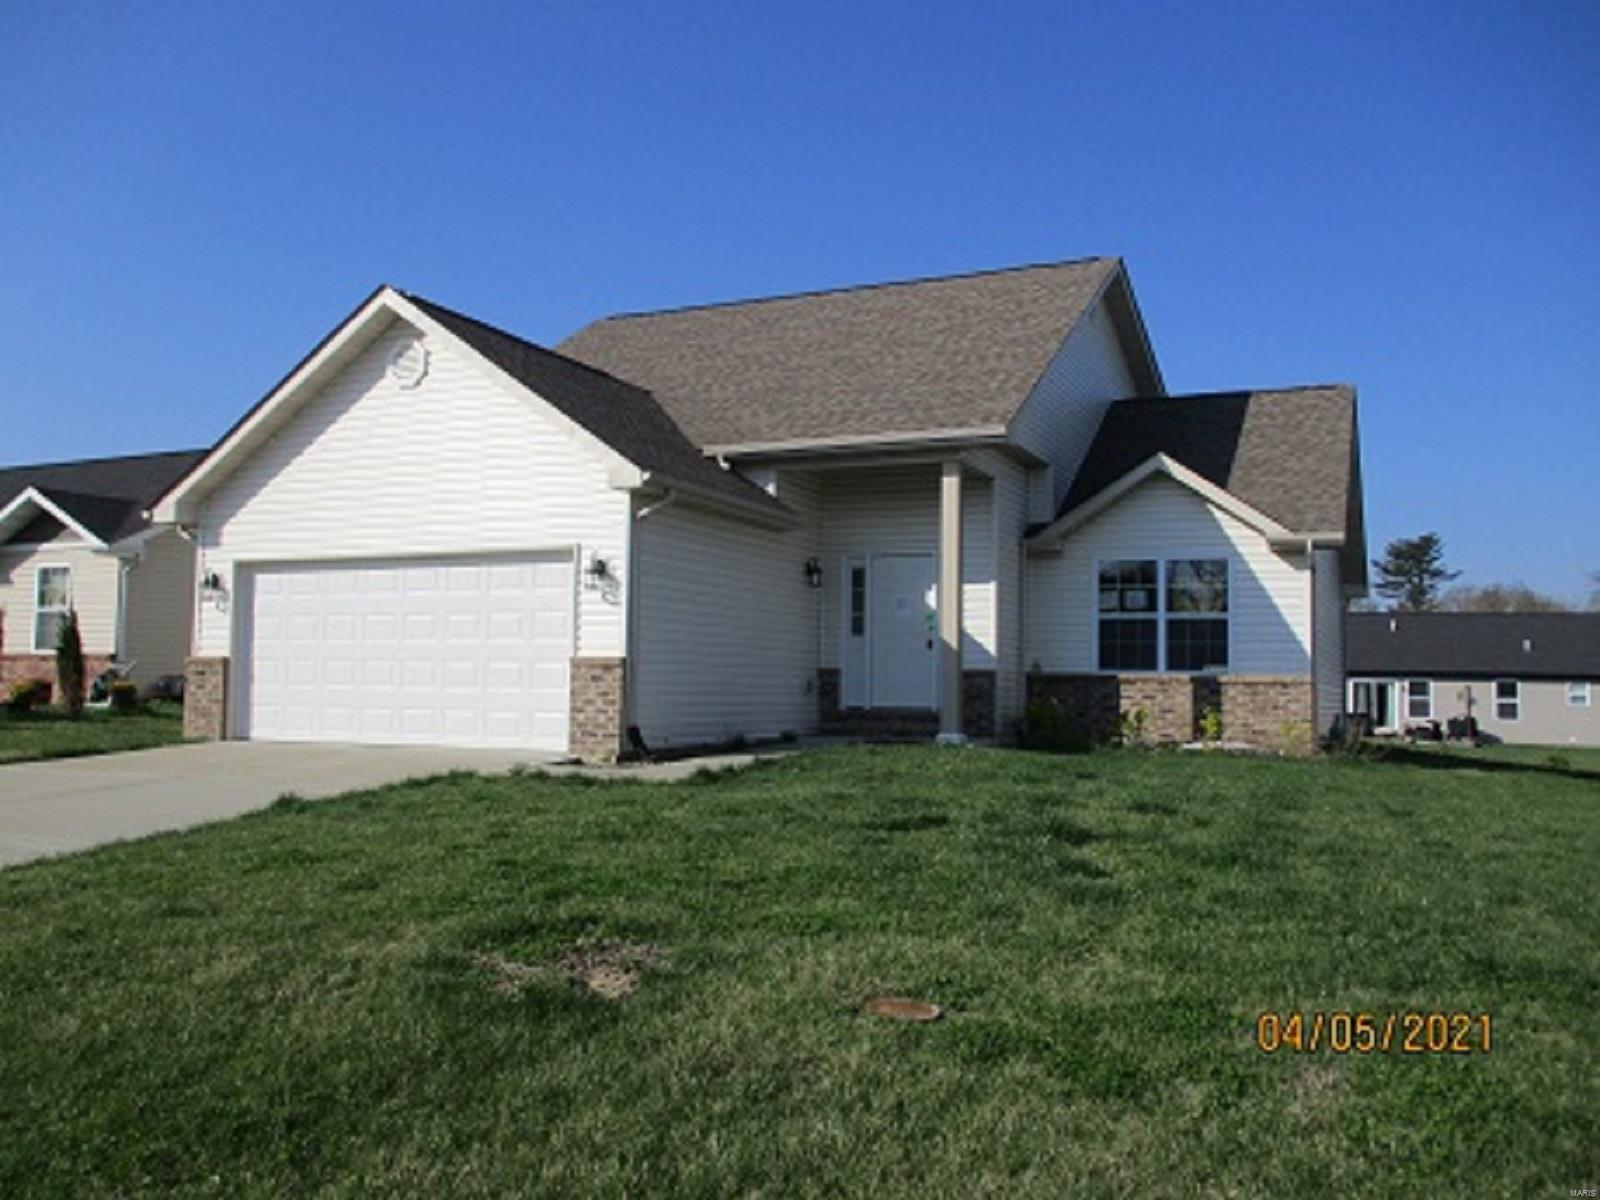 7910 LAUREL FLATS Drive Property Photo - Caseyville, IL real estate listing